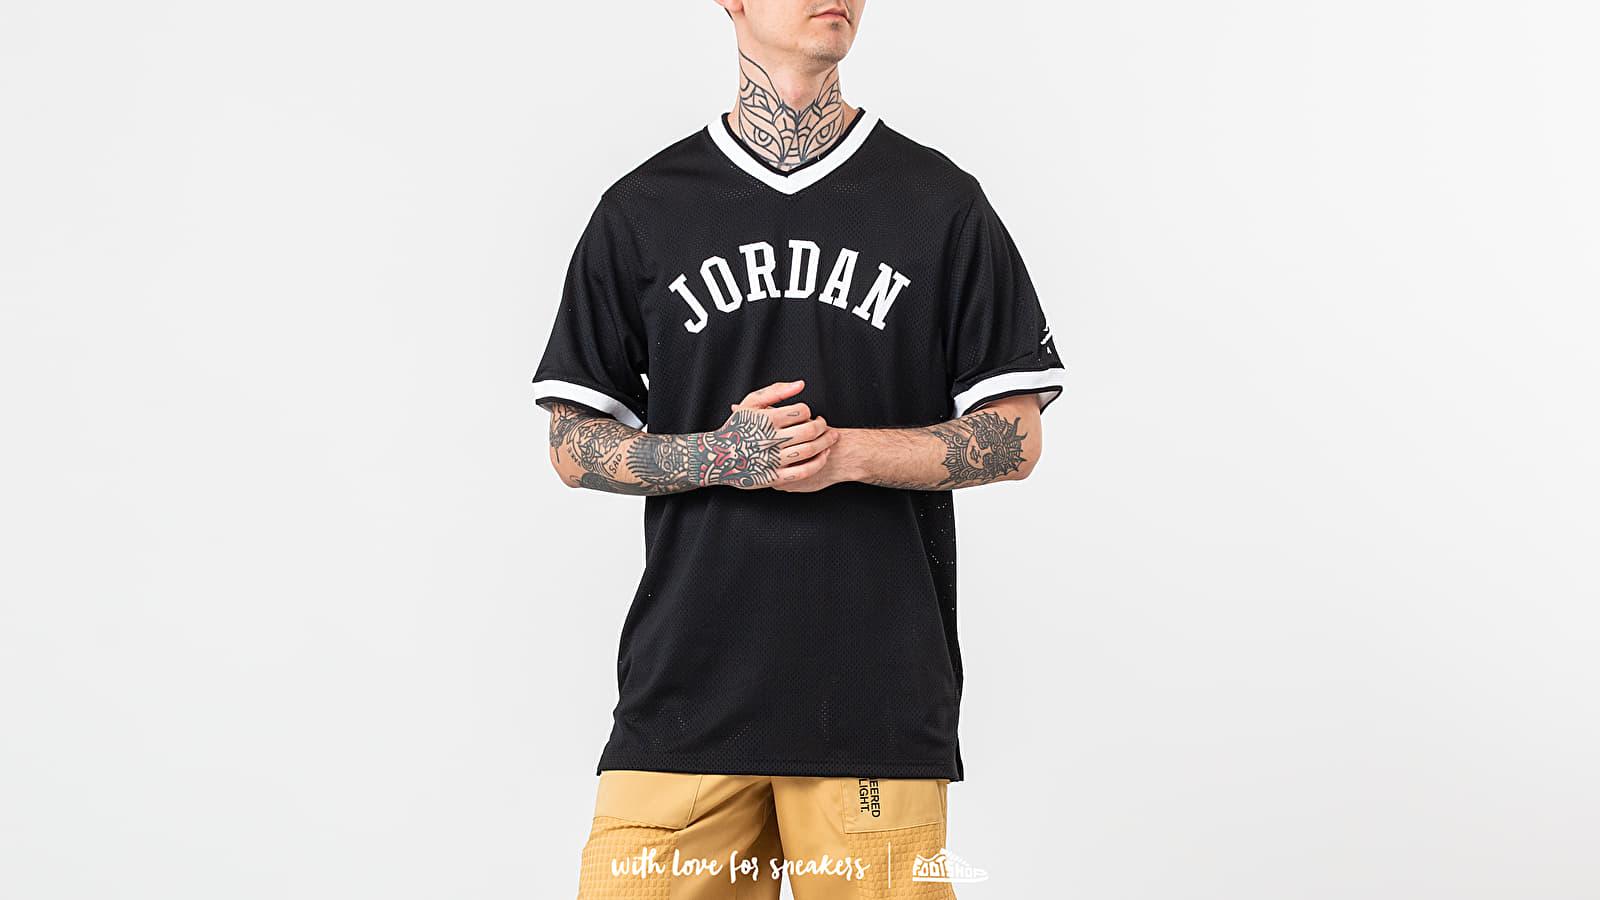 casete habilitar Apropiado  T-shirts Jordan Jumpman Air Mesh Jersey Black | Footshop